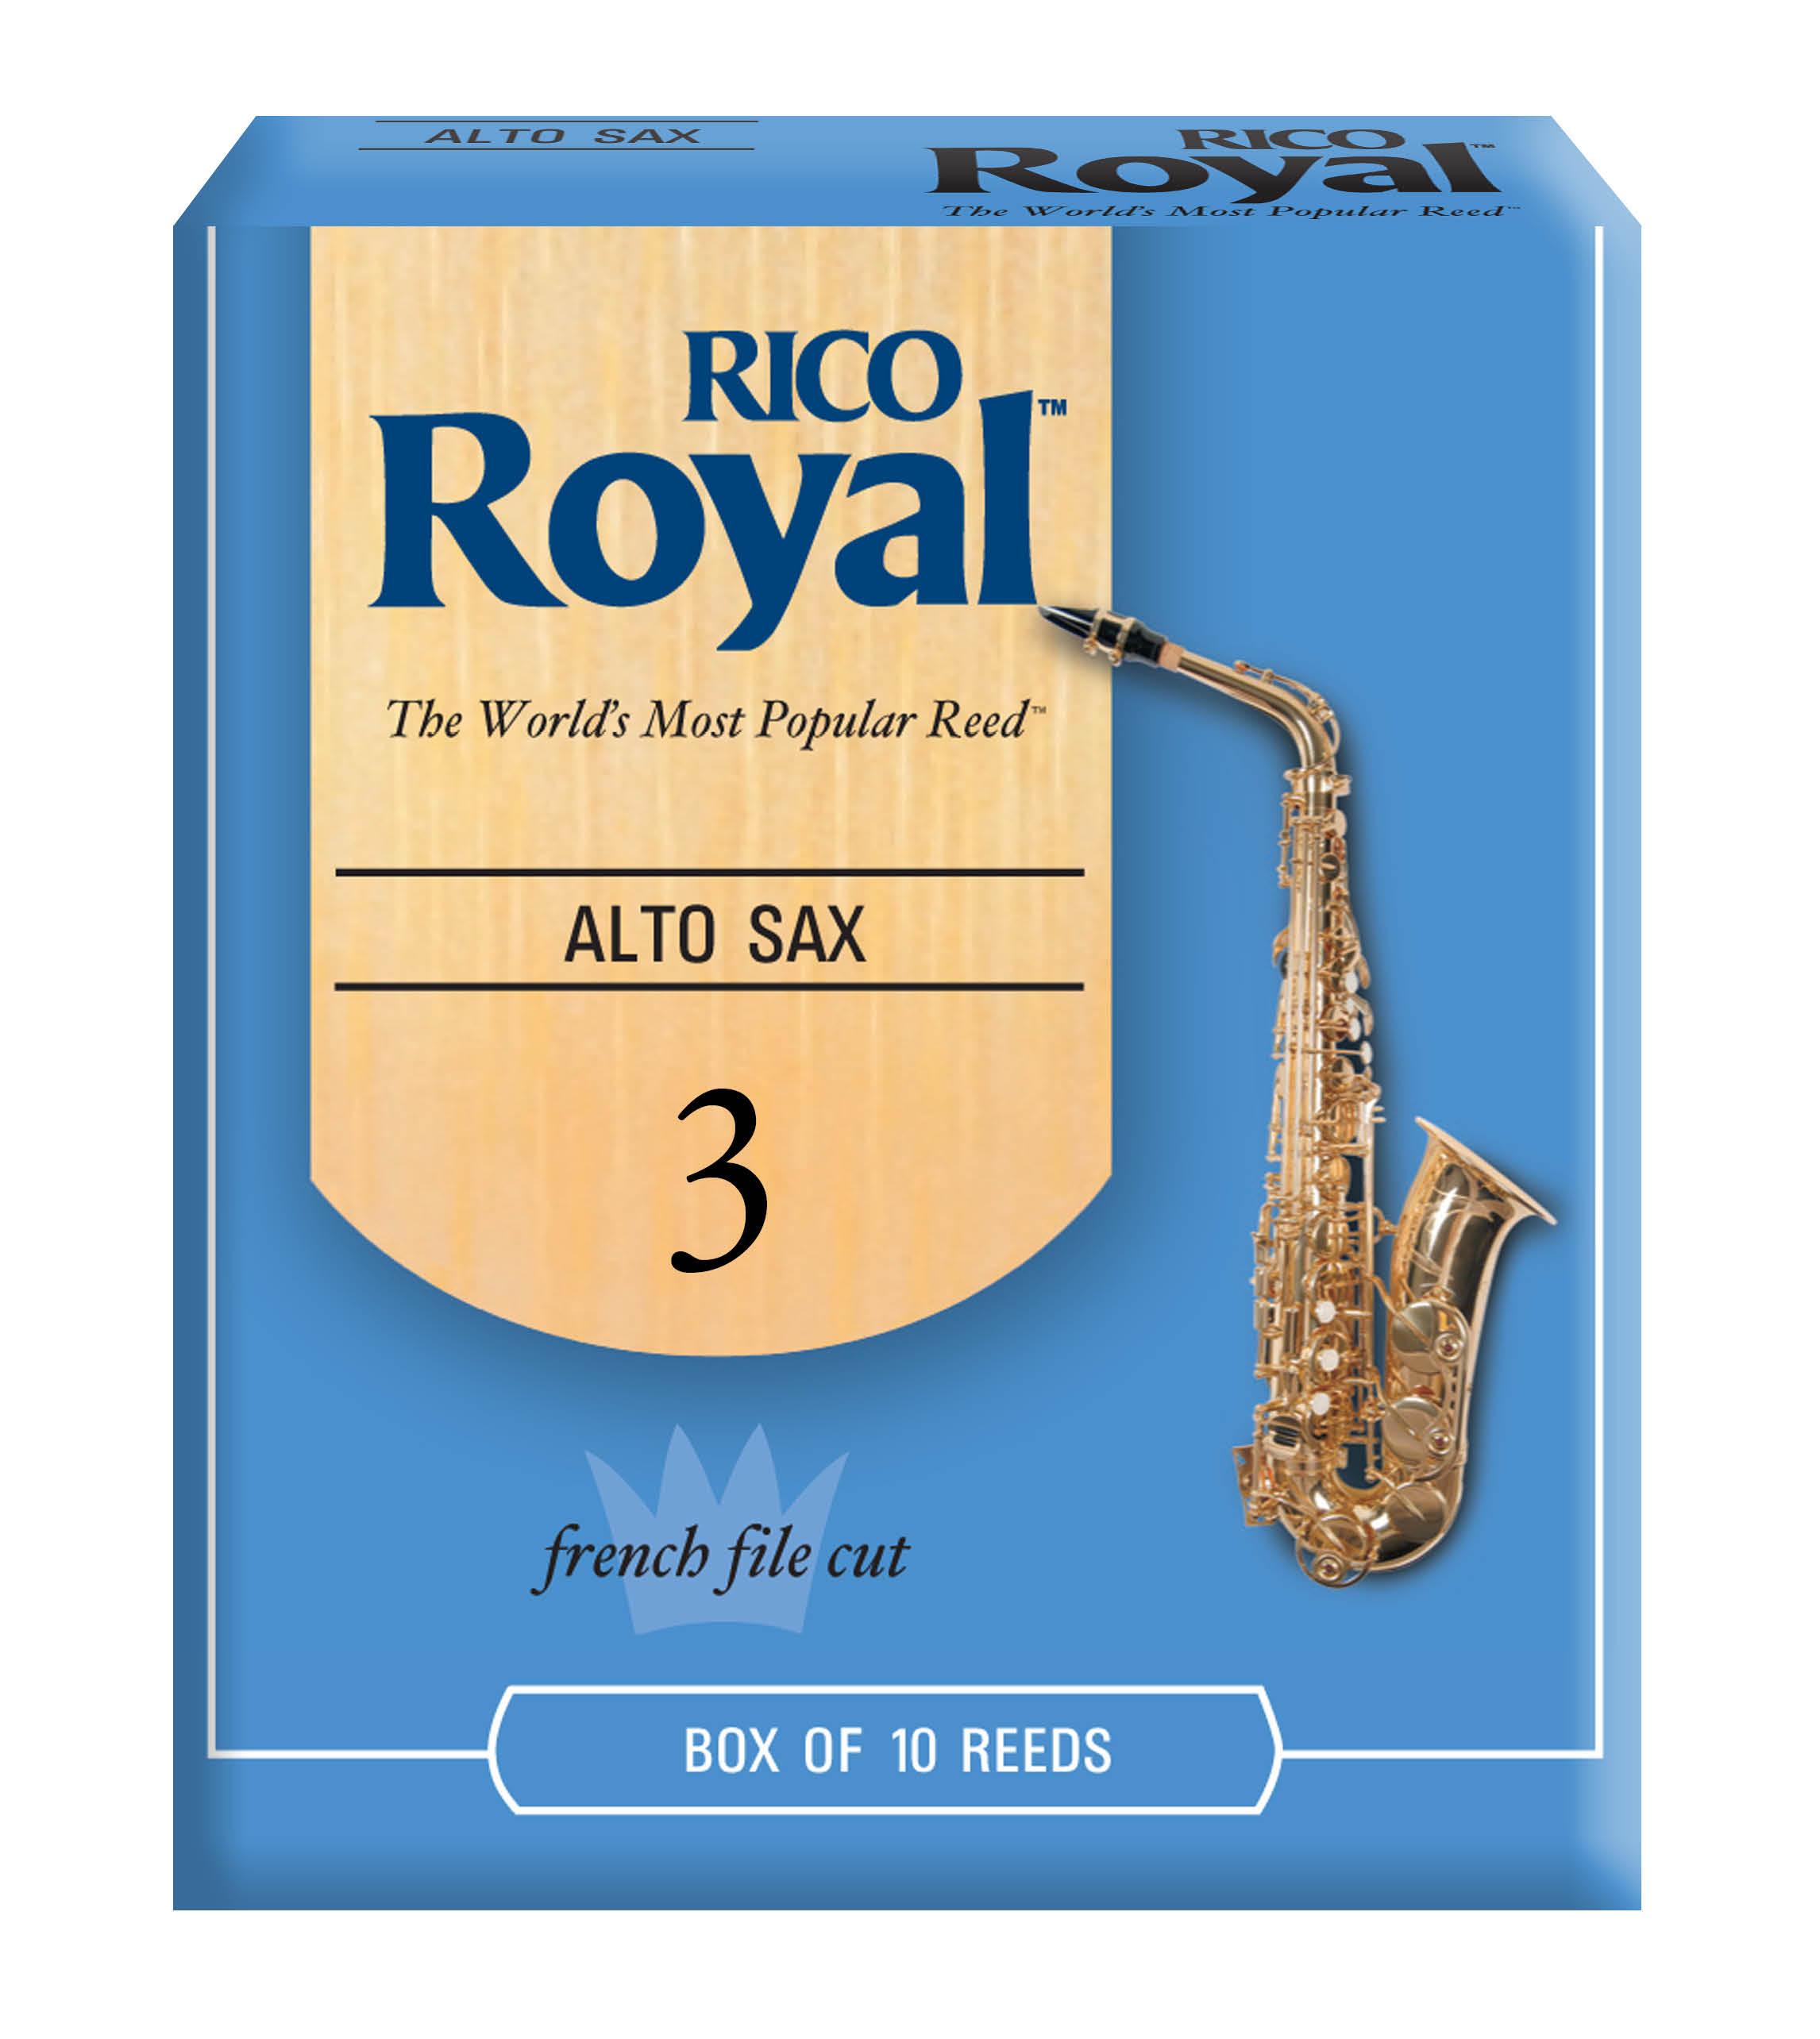 RICO ROYAL 3 ALTO SAX REED 10